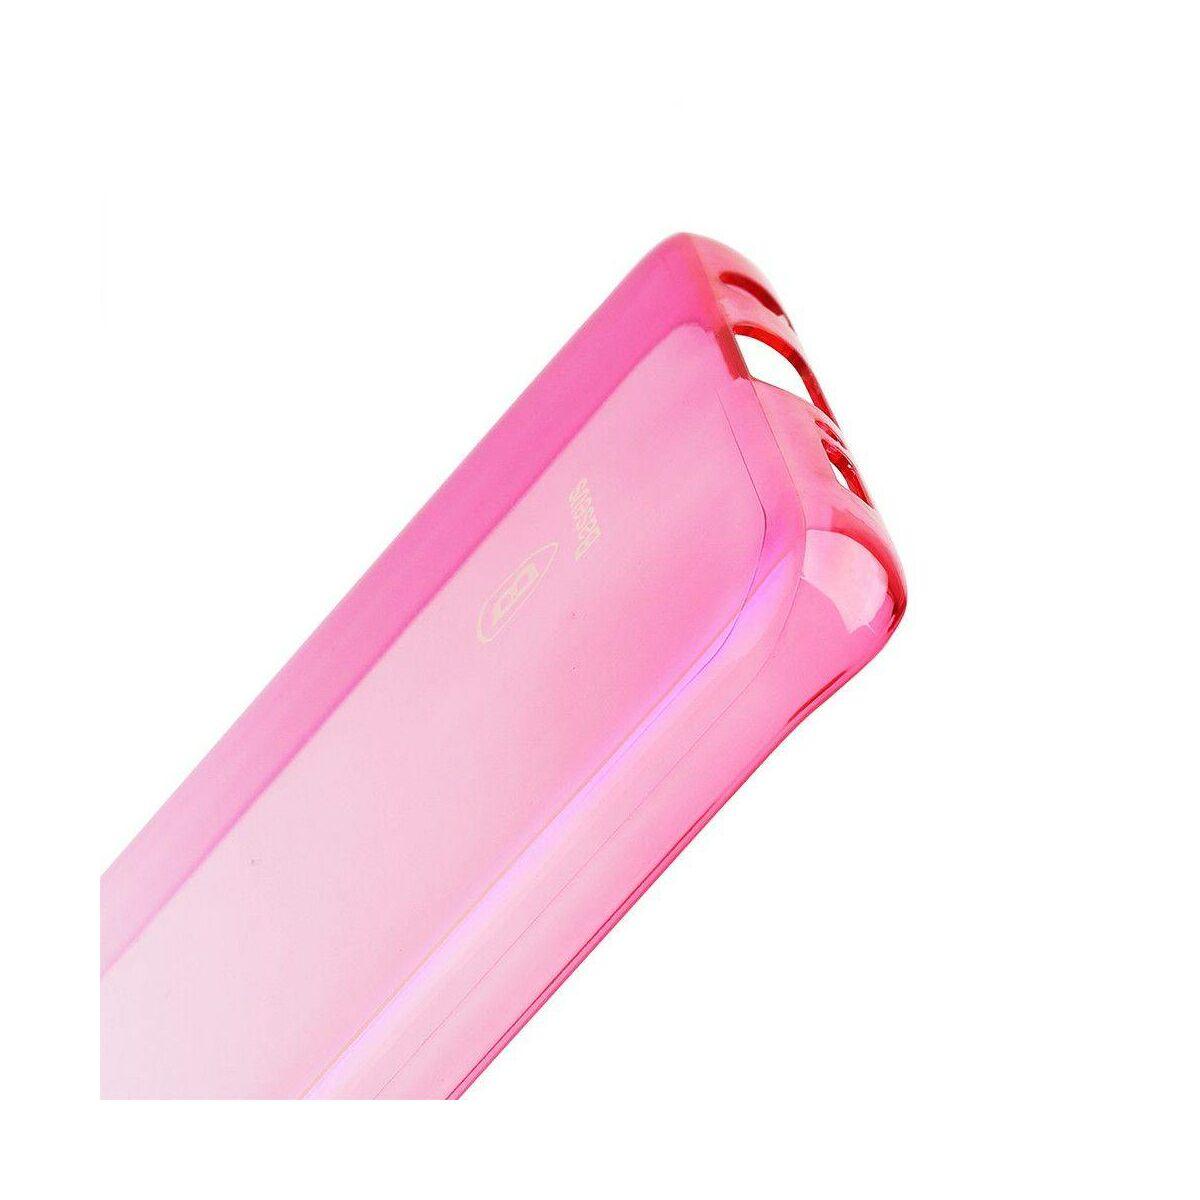 Baseus Samsung S9 tok, Glaze, rózsaszín (WISAS9-GC04)